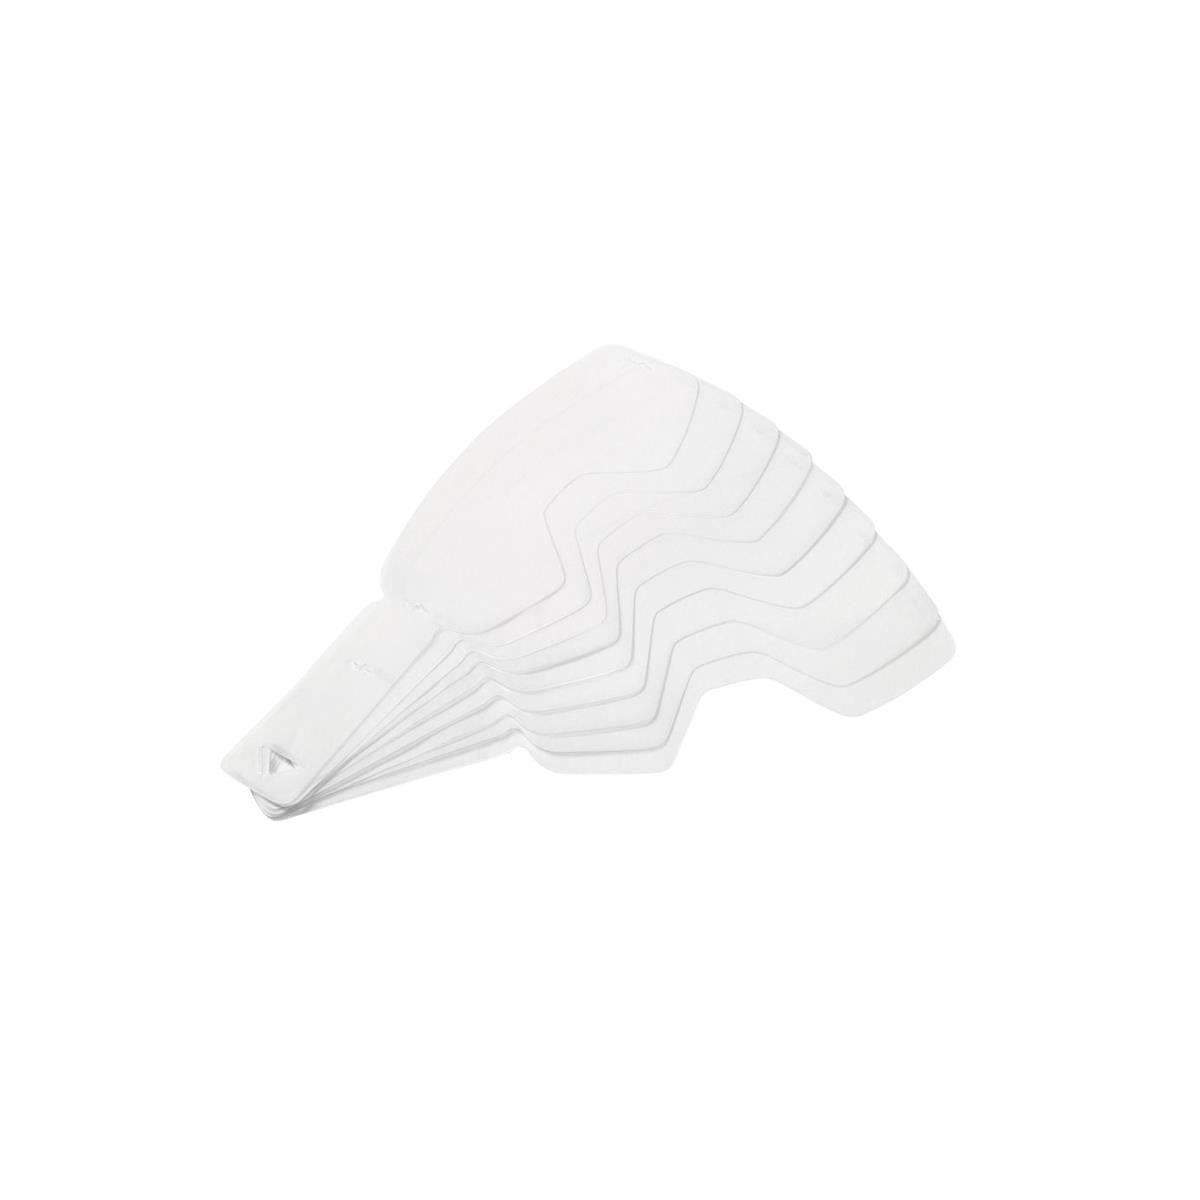 Blok MTB Goggle Tear-Offs (10 Pack)